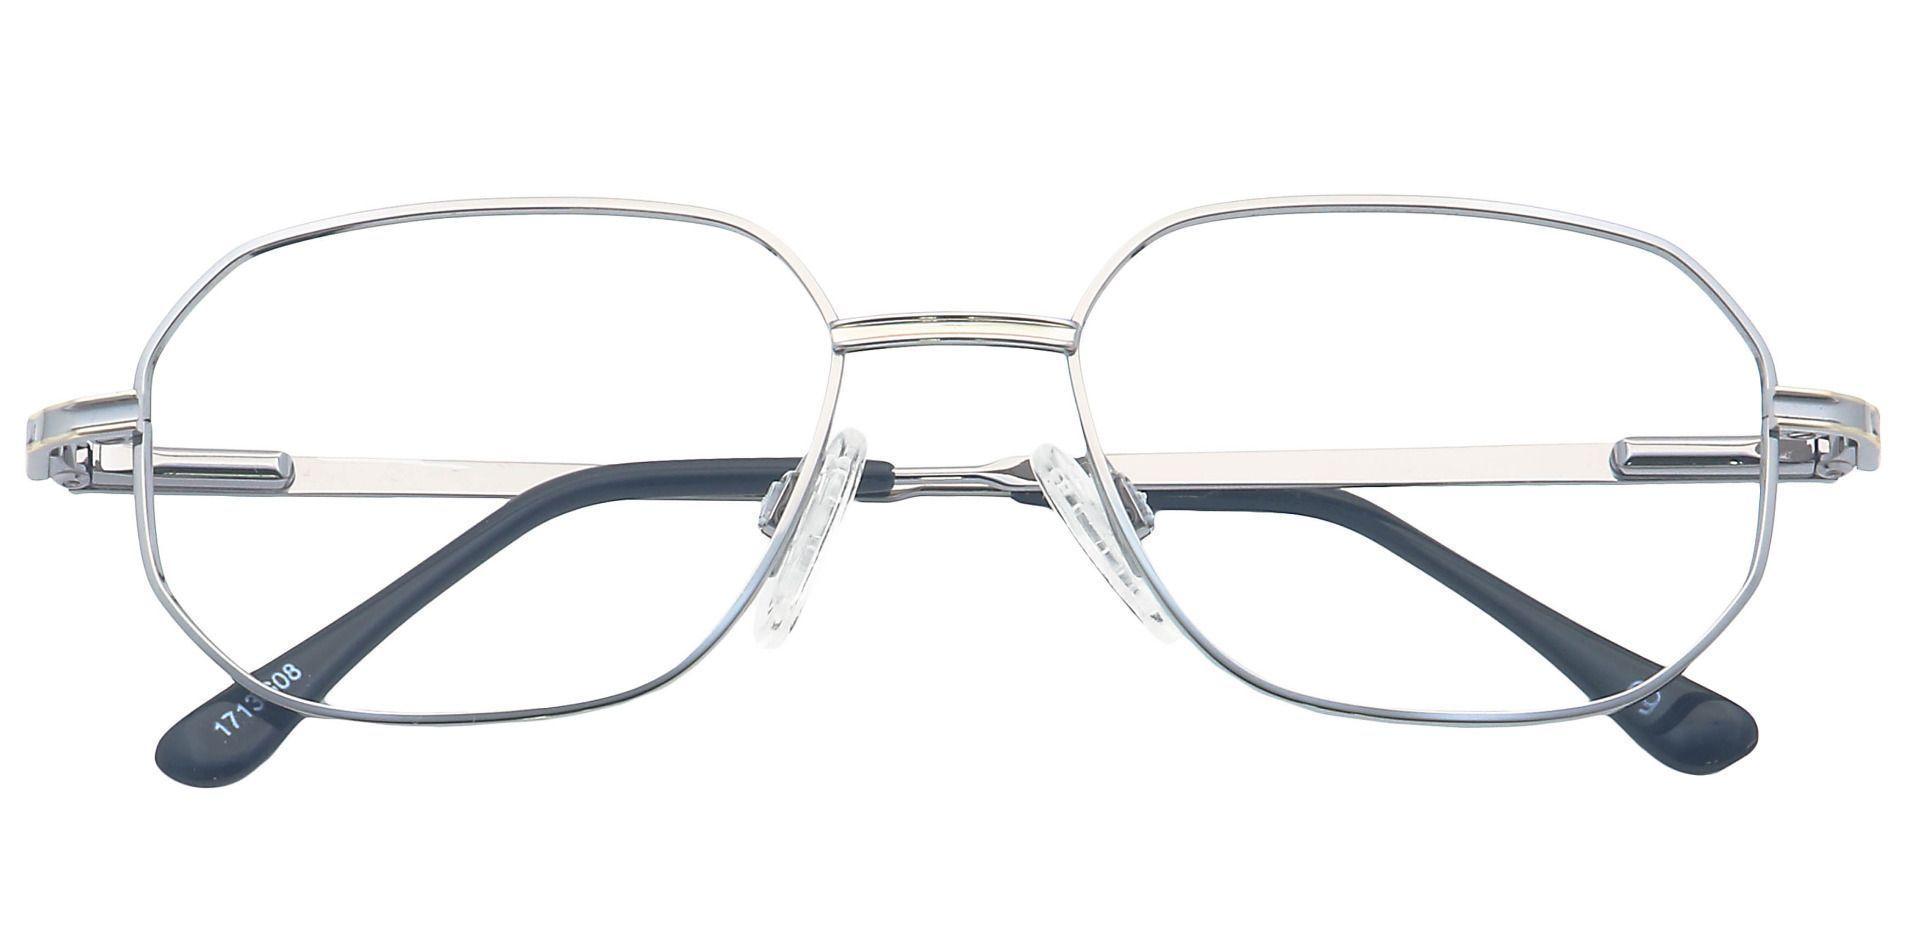 Russell Rectangle Prescription Glasses - Gray